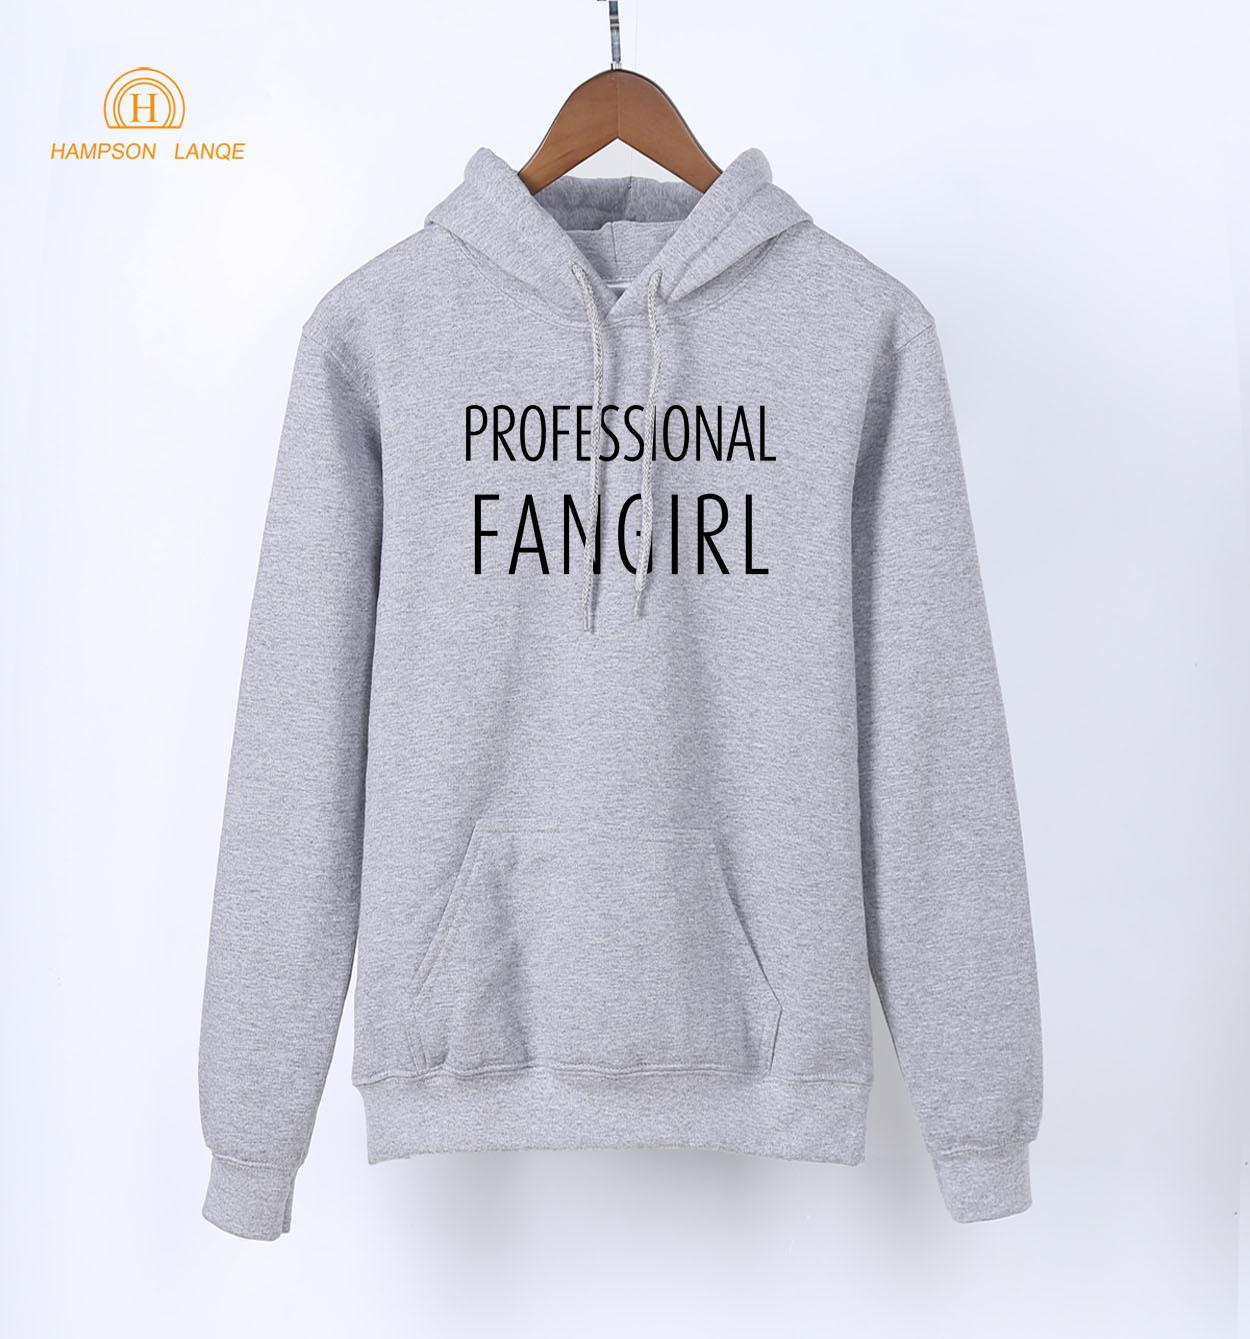 HAMPSON LANQE Professional Fangirl Print Korean Gray Hoodies Women 2019 Spring Autumn Kawaii Sweatshirts Female K-pop Hoodies